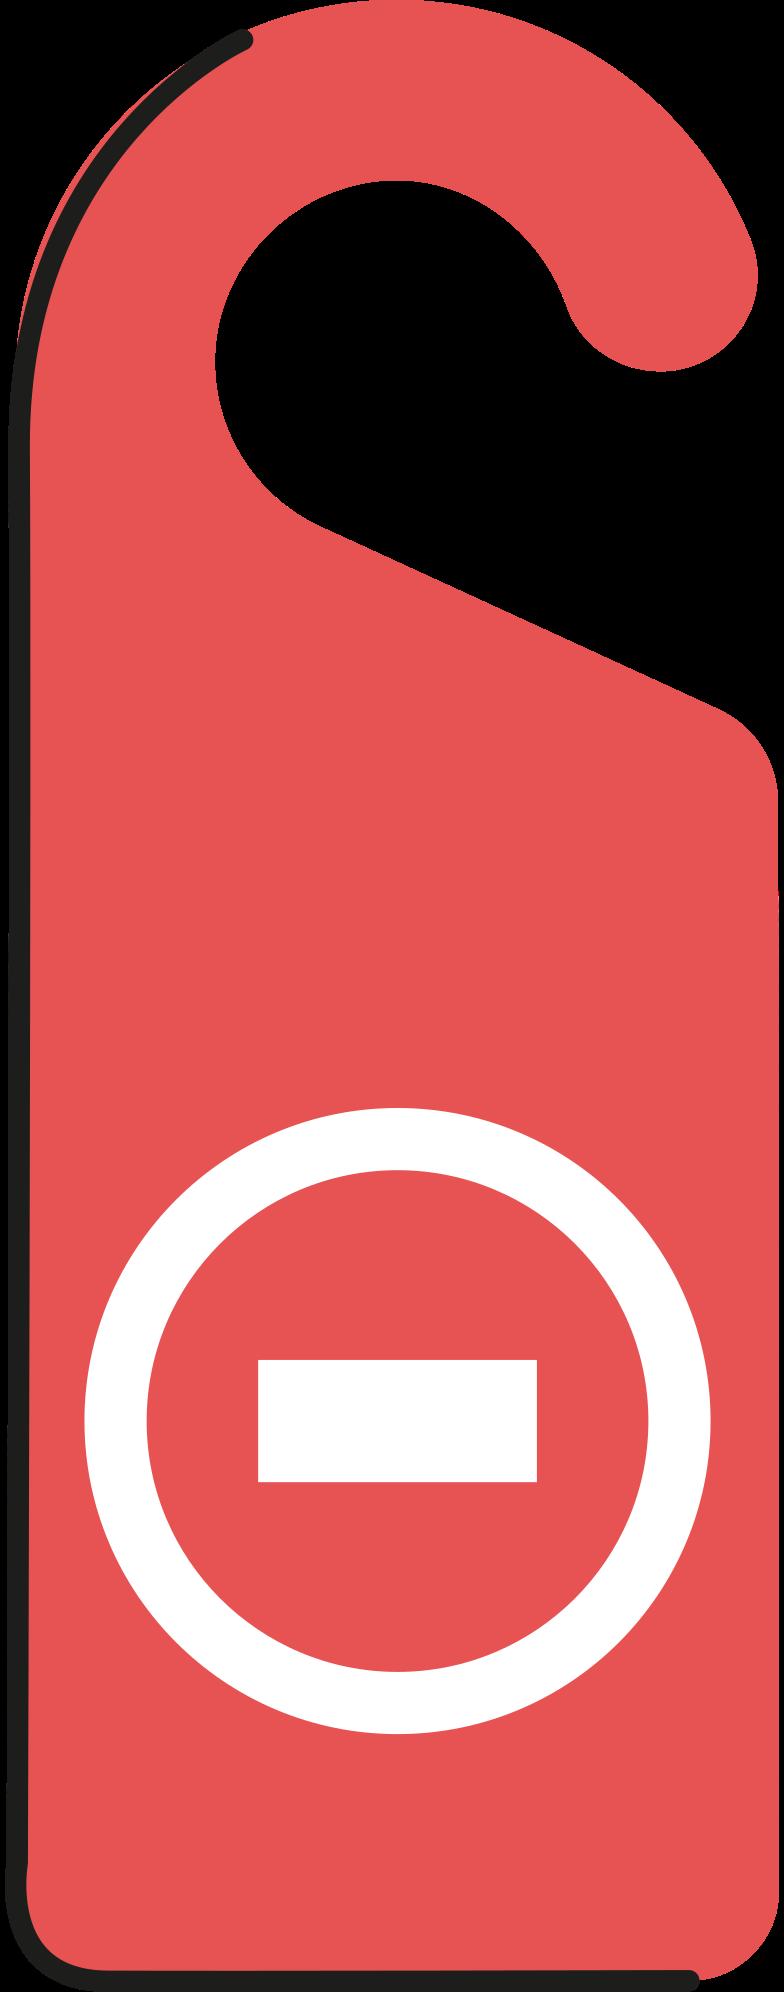 door-hanger Clipart illustration in PNG, SVG